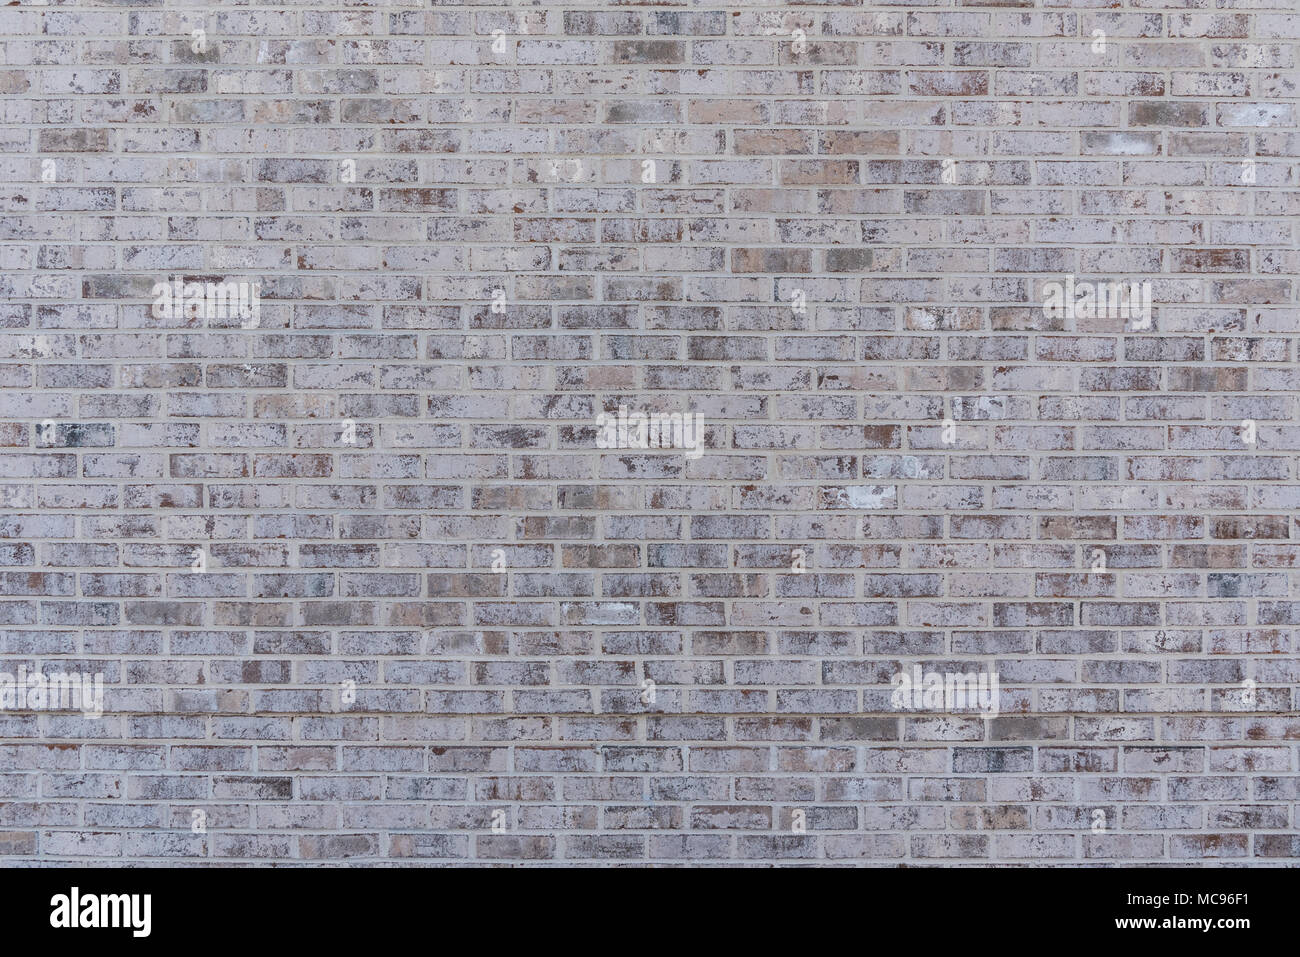 Tan Brick Wall Texture provides horizontal background image - Stock Image